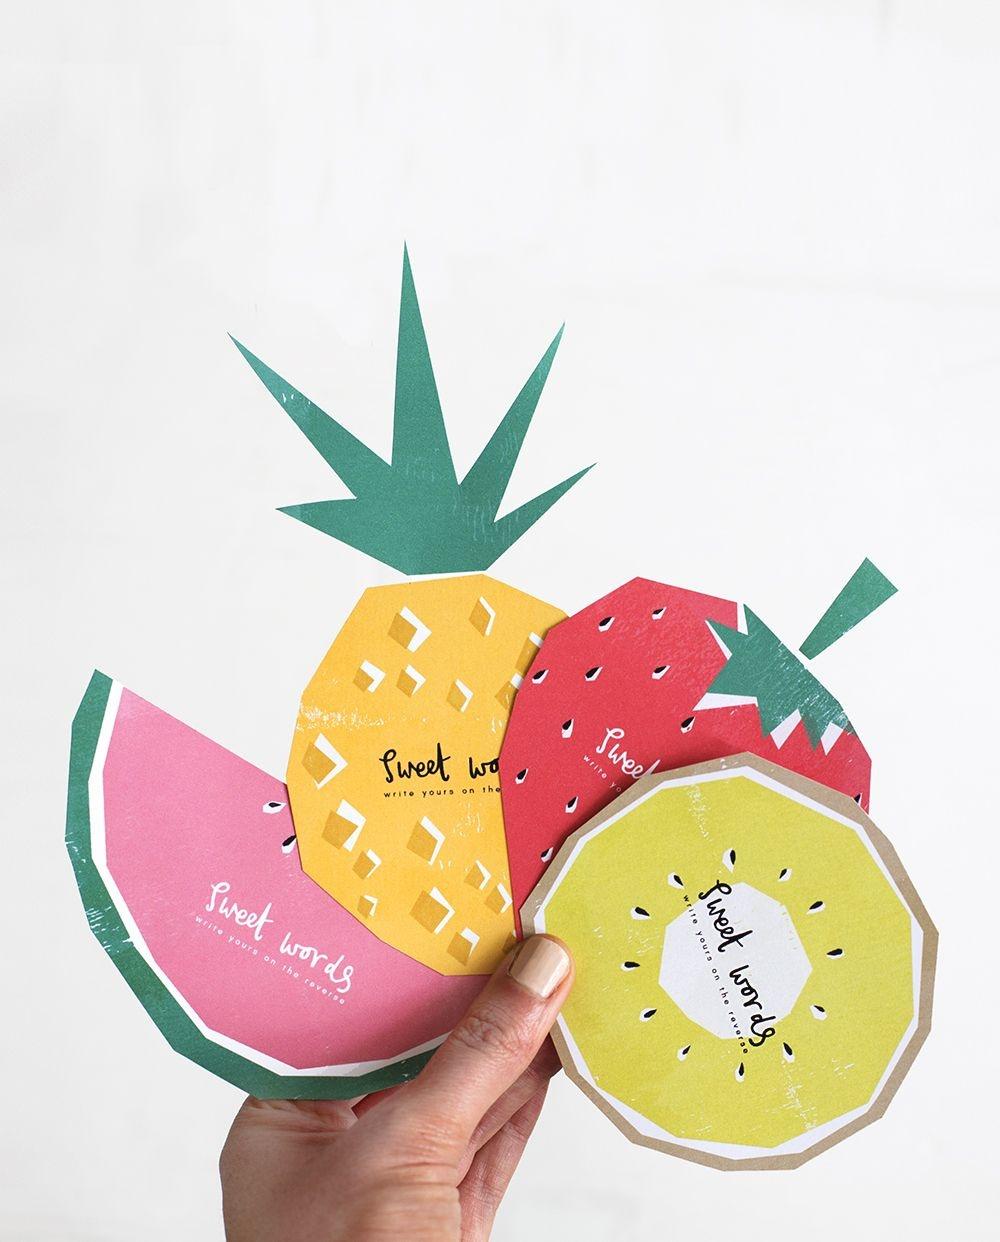 Bespoke Bride: Fruity Printables | Free Printables | Free Printables - Tutti Frutti Free Printables